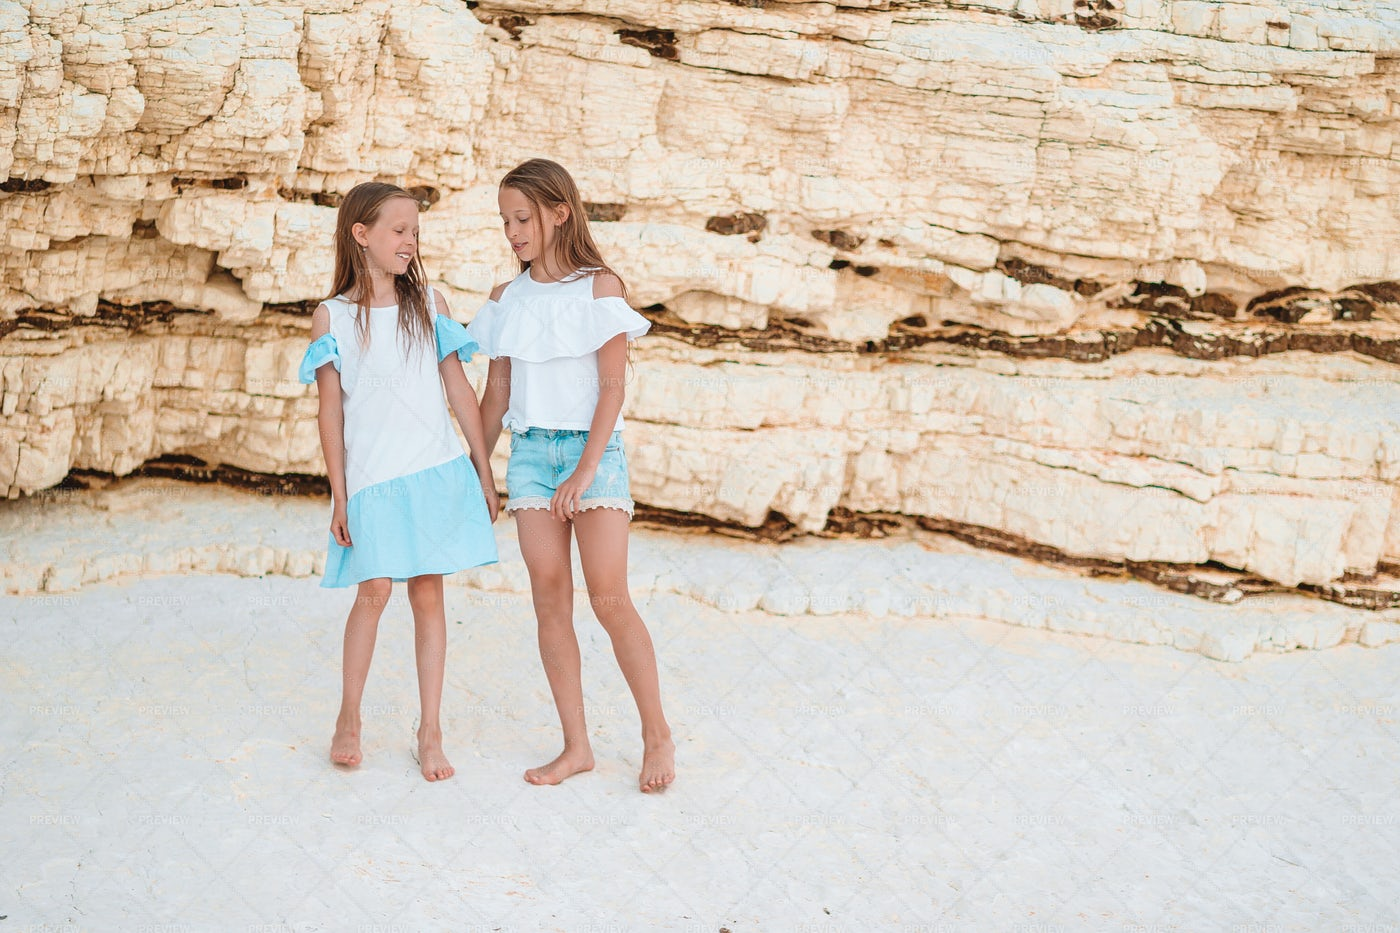 Sisters Enjoying Summer: Stock Photos